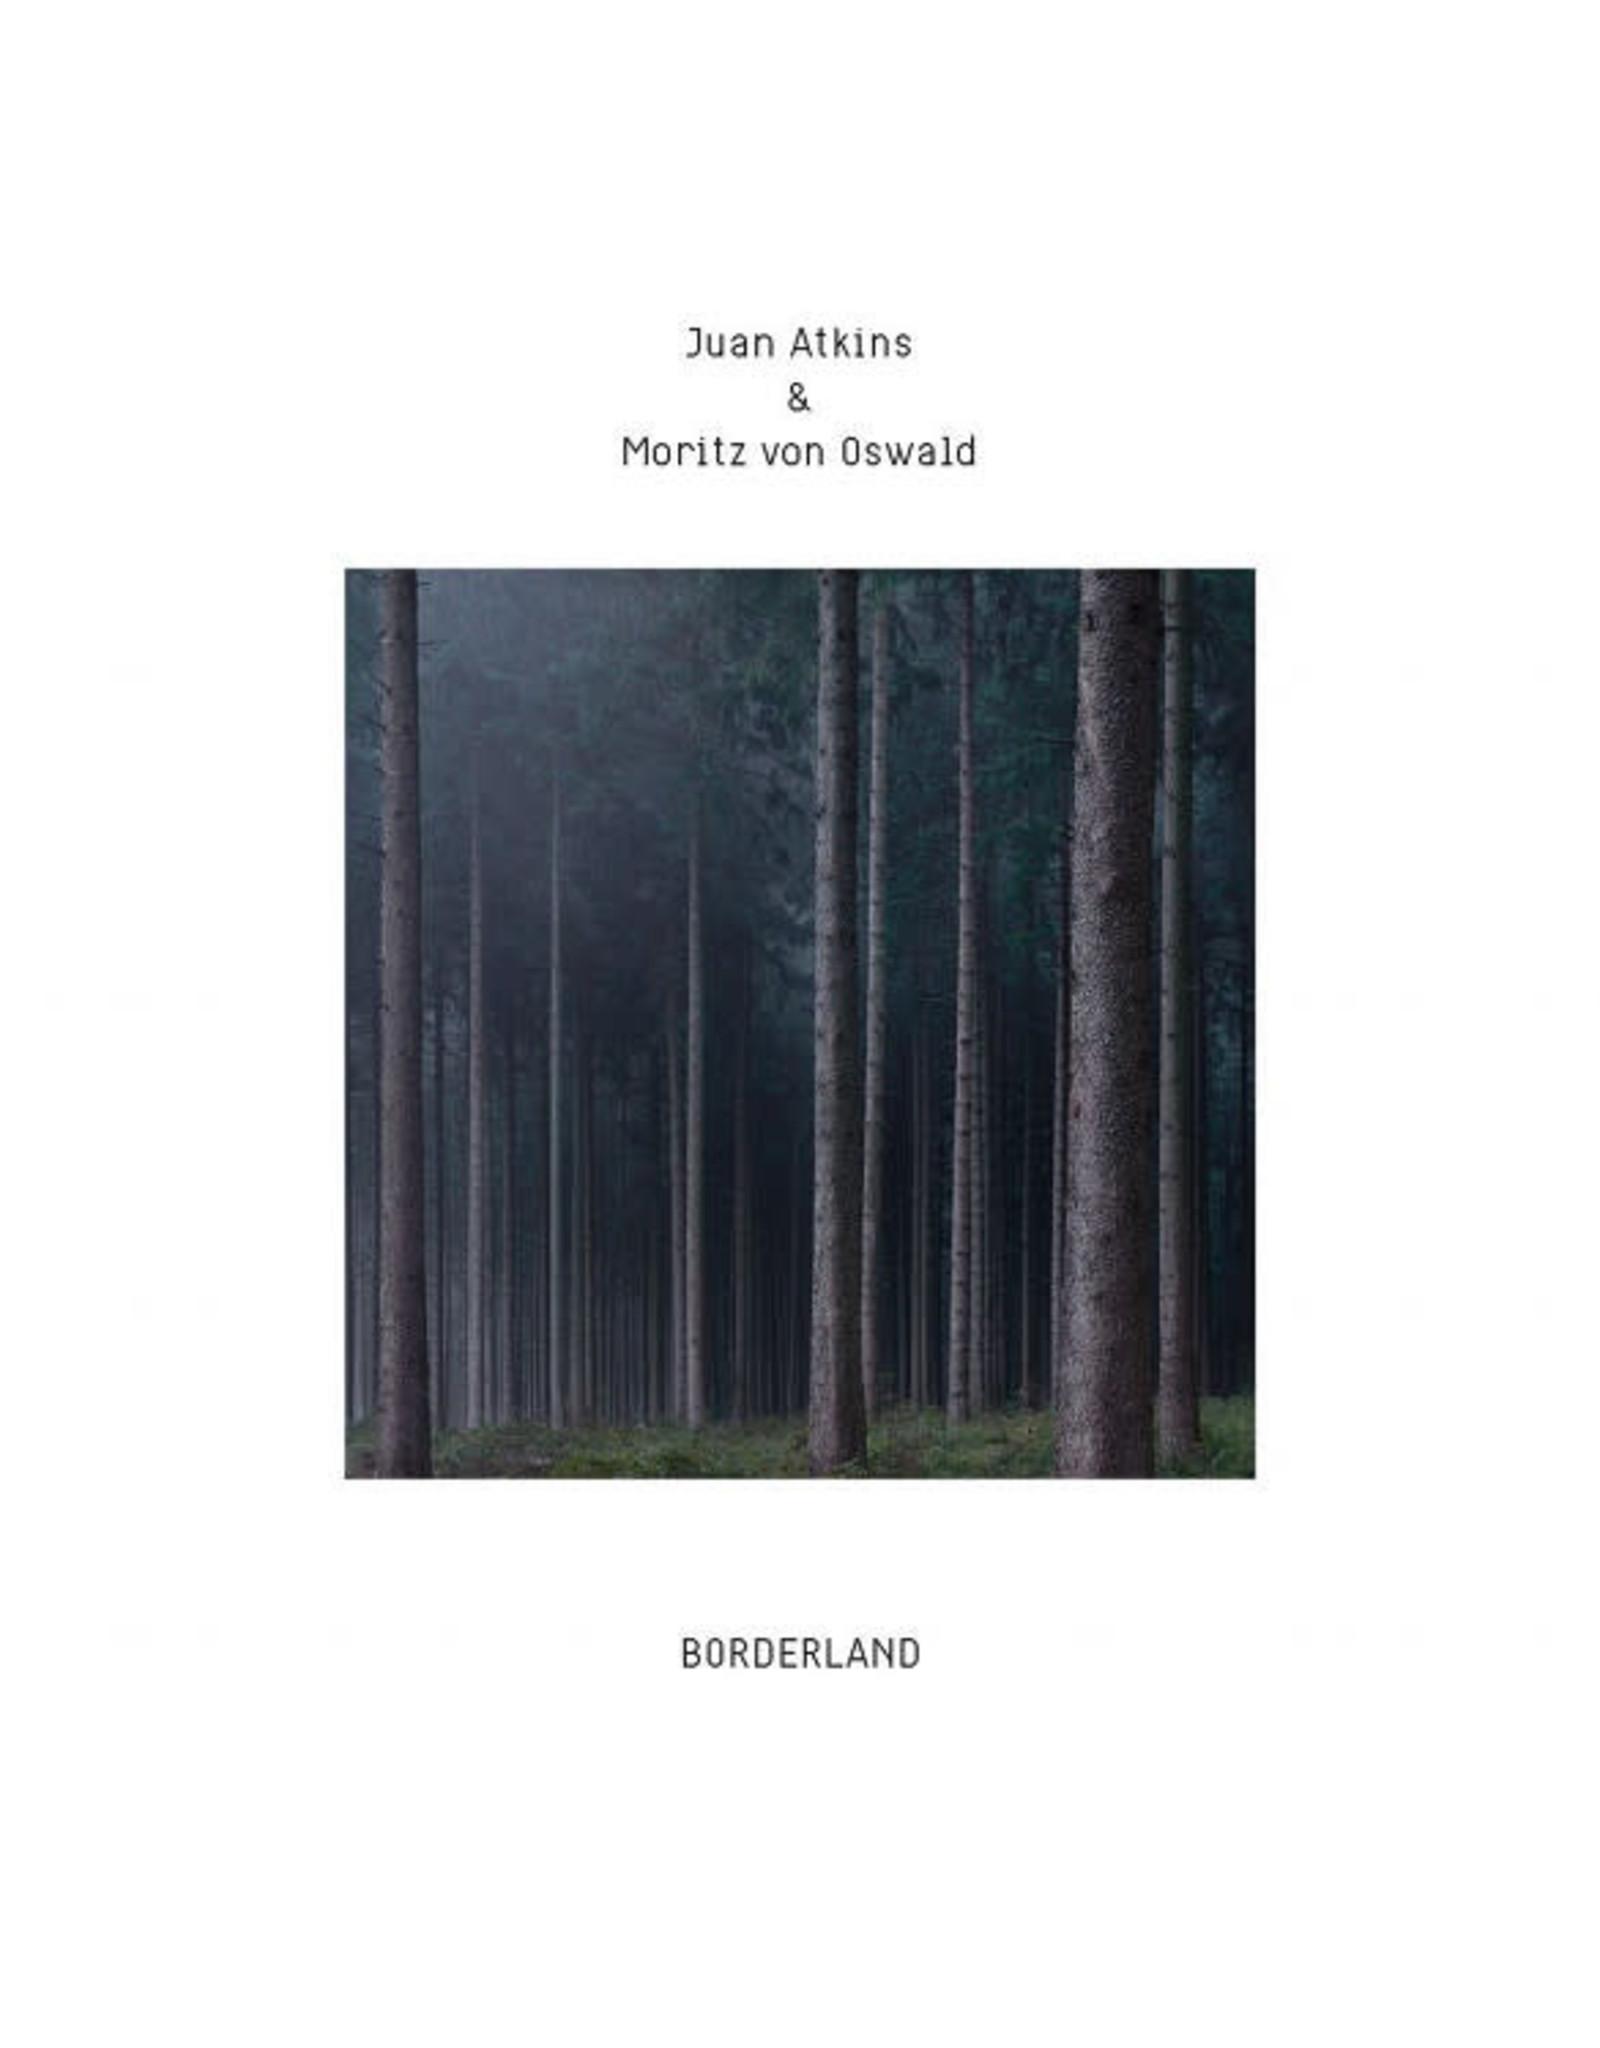 Atkins, Juan & Mortiz von Oswald - Borderland CD